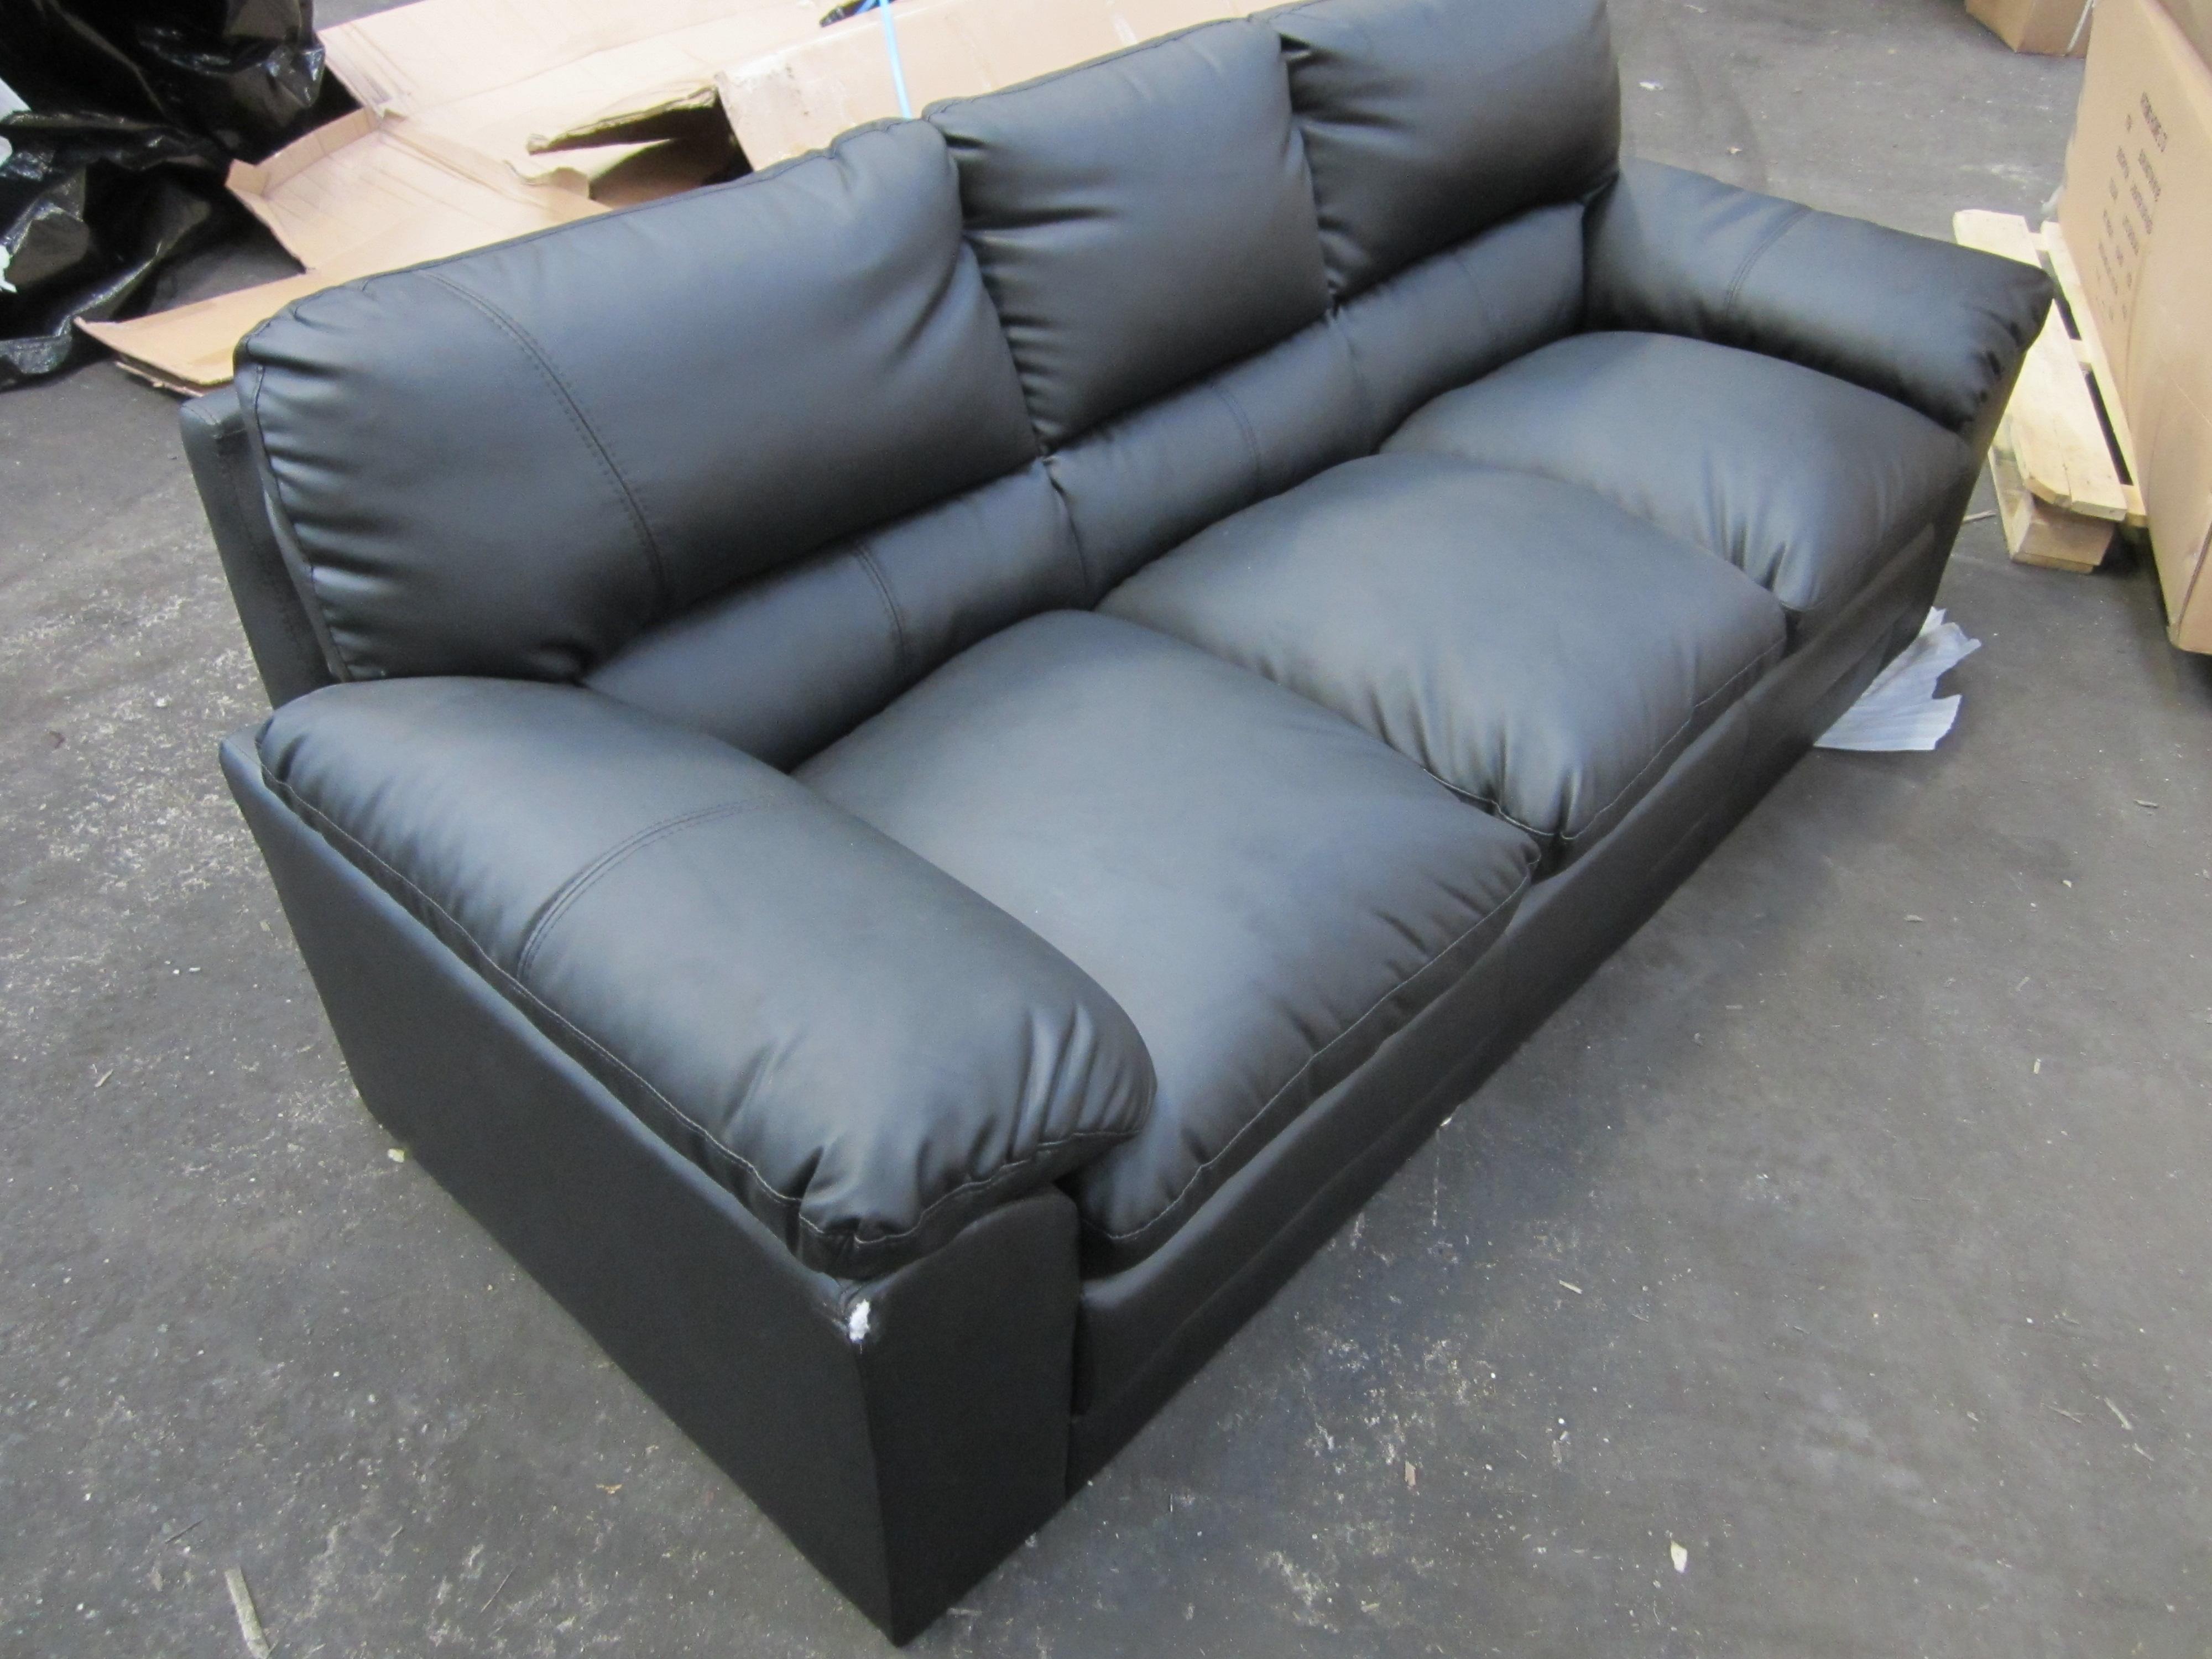 3 Seat Leather Sofa Black New Slight Damage Naa26 Ebay